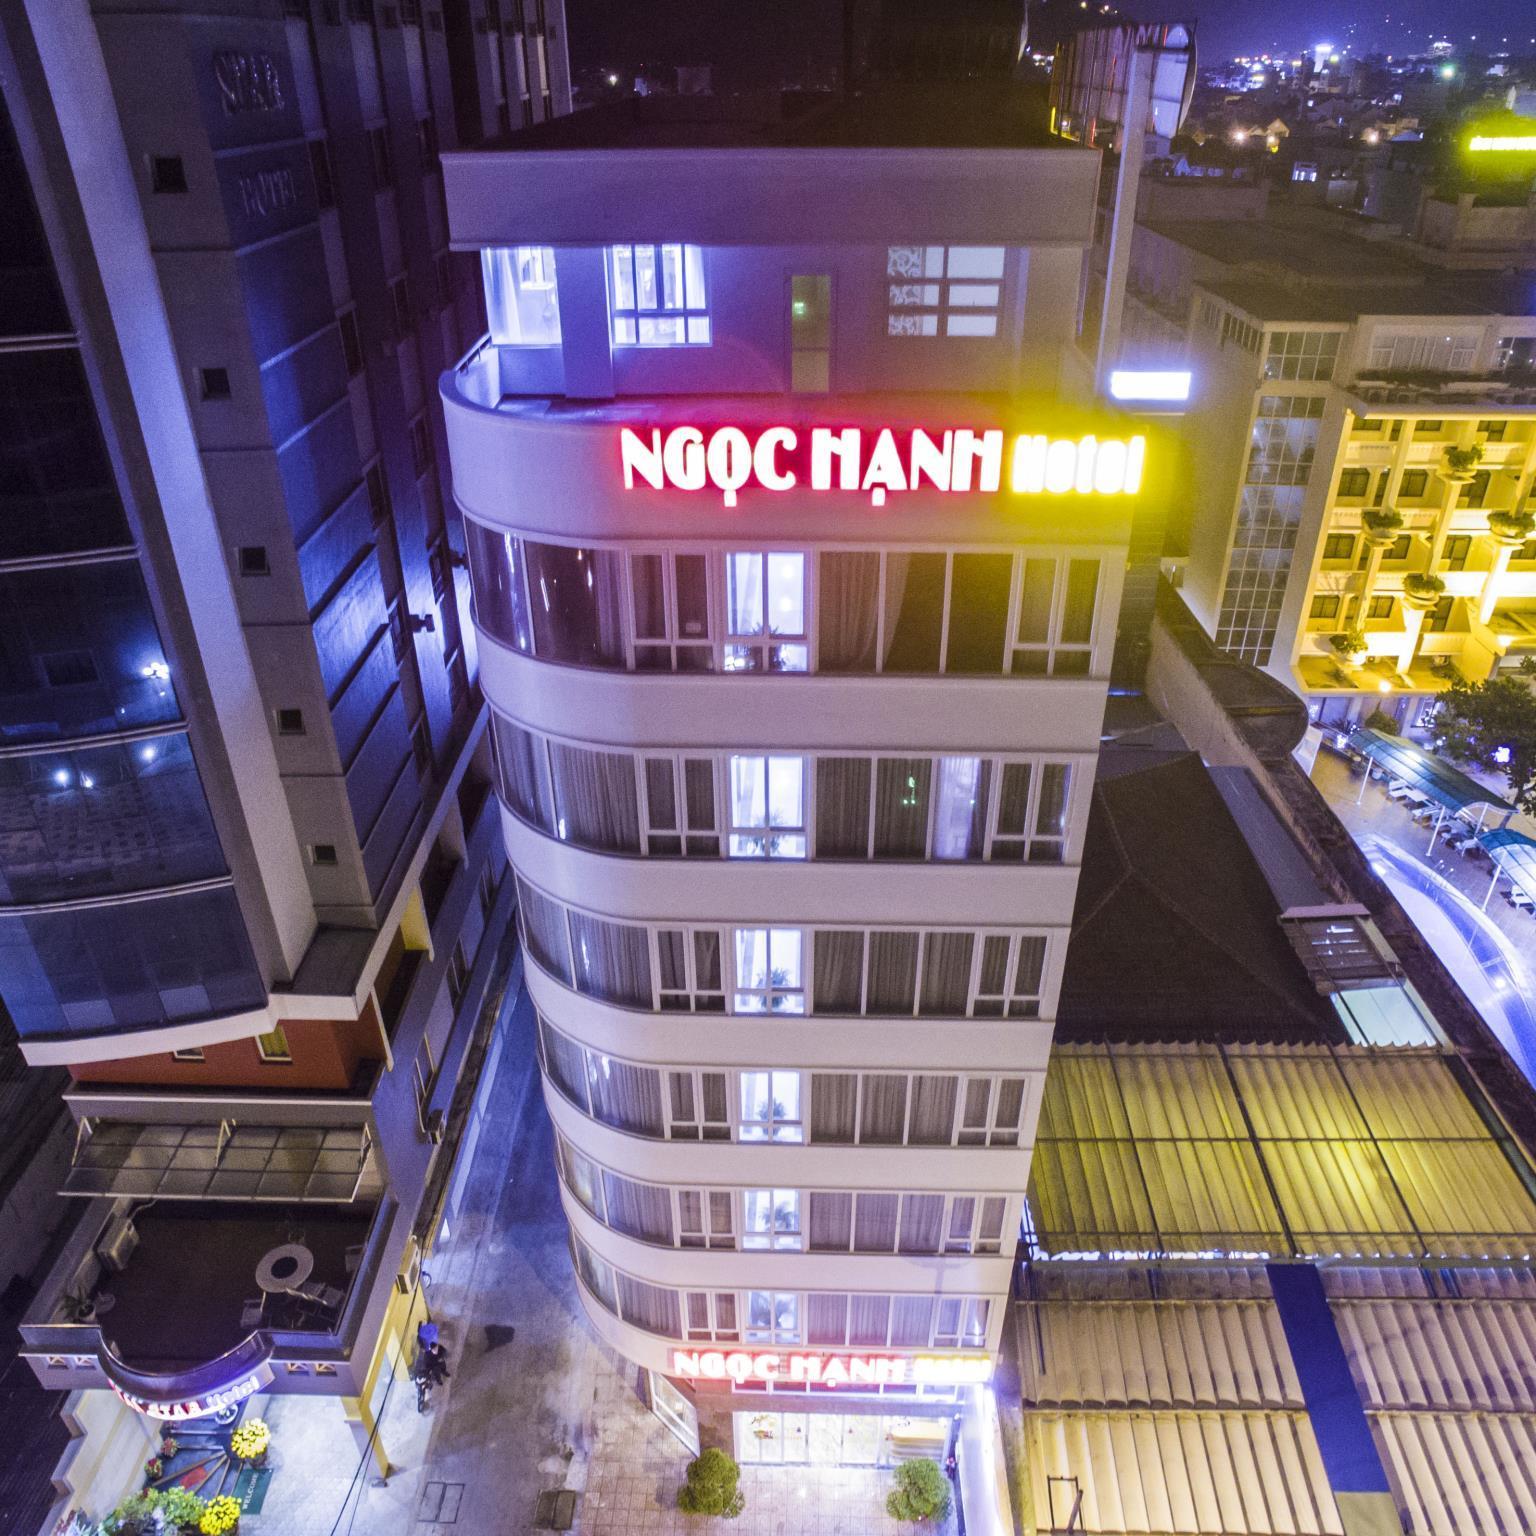 Ngoc Hanh Beach Hotel